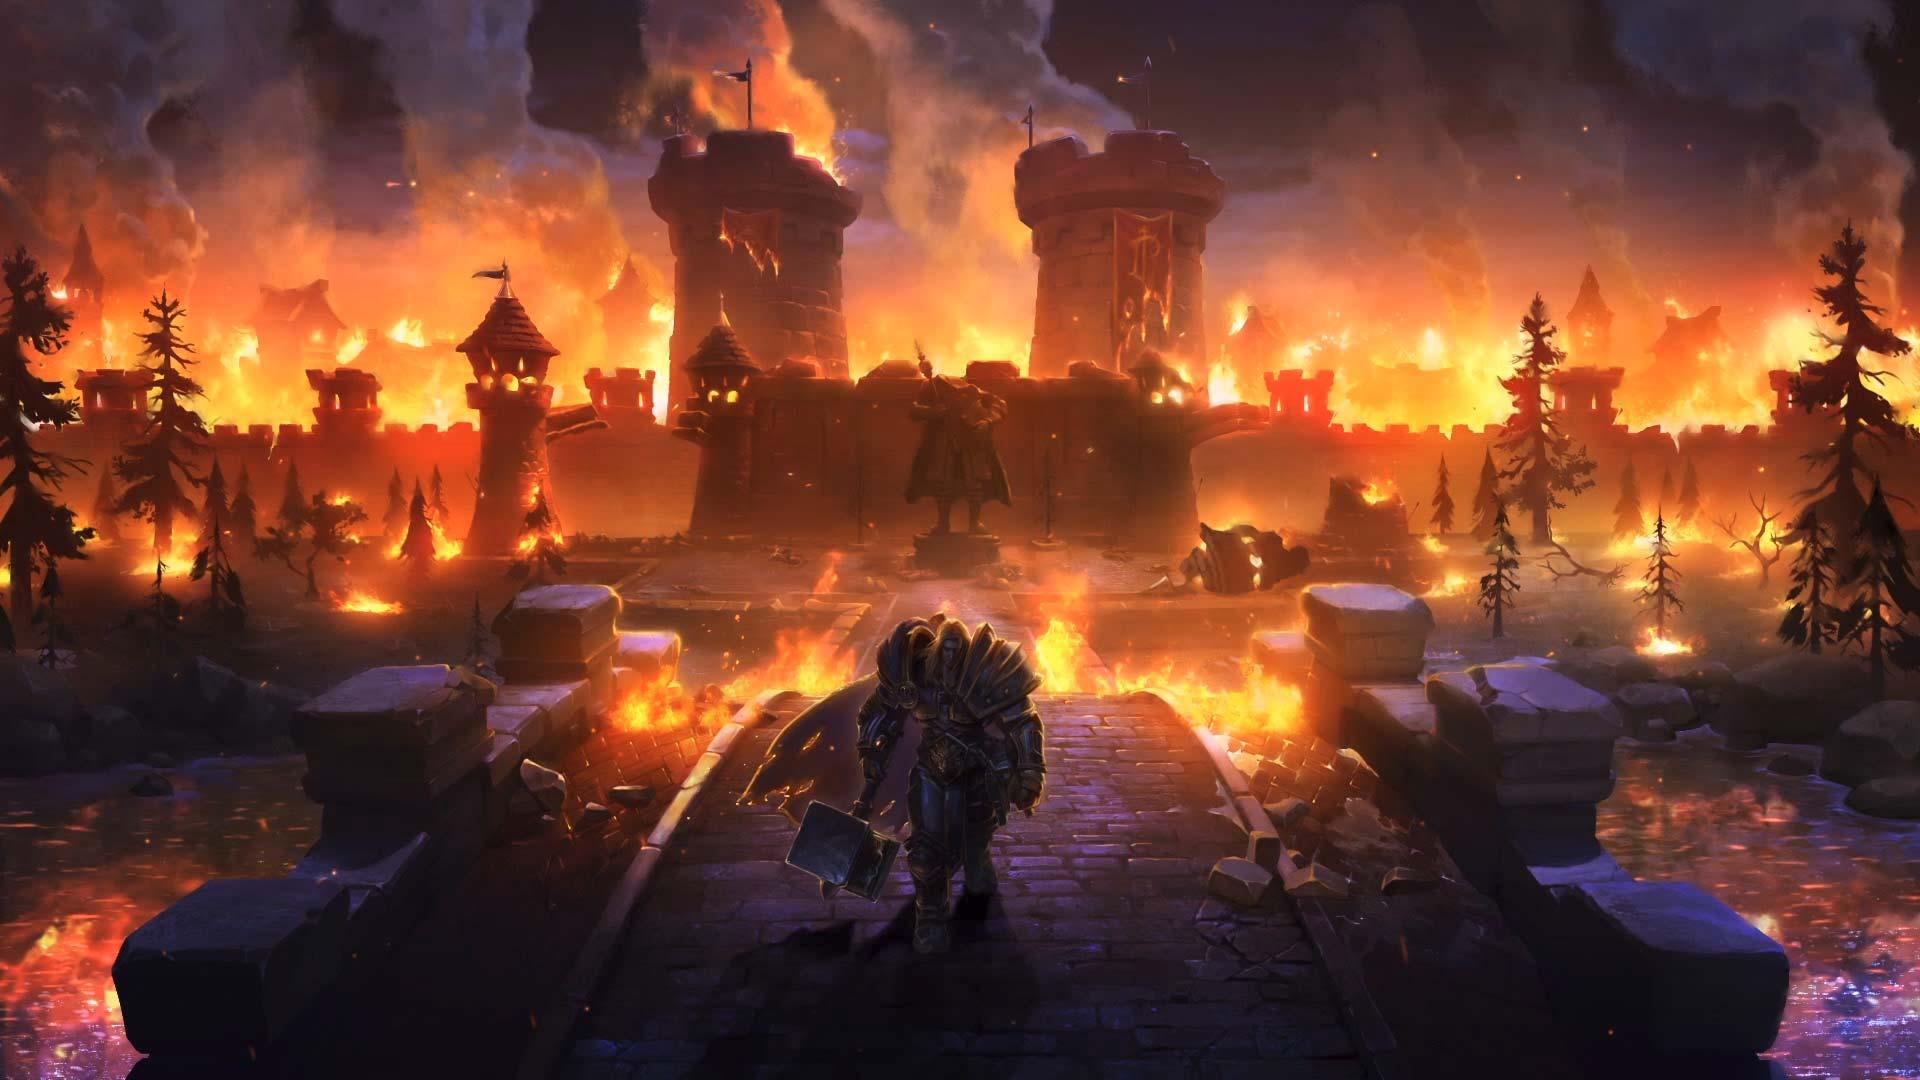 Warcraft 3 Reforged Arthas 1920x1080 Wallpaper Teahub Io